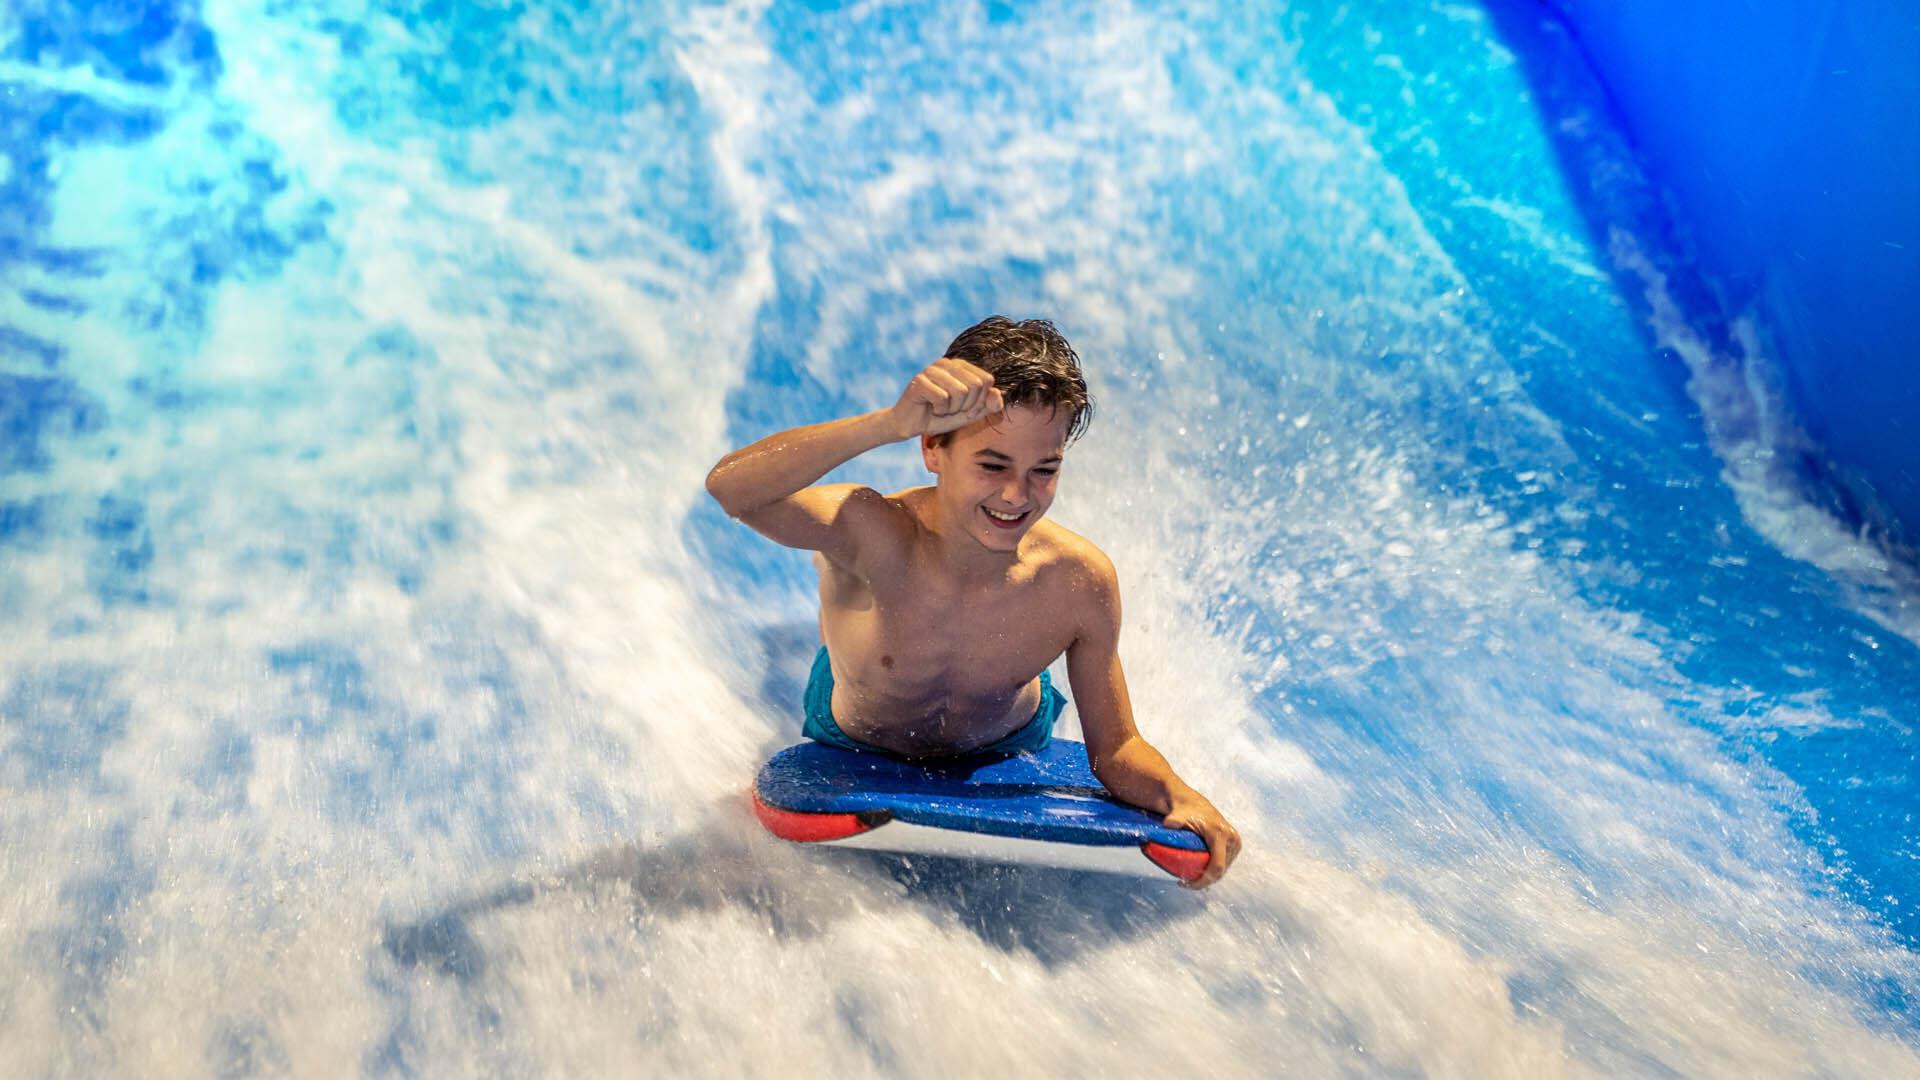 surffaus lapset